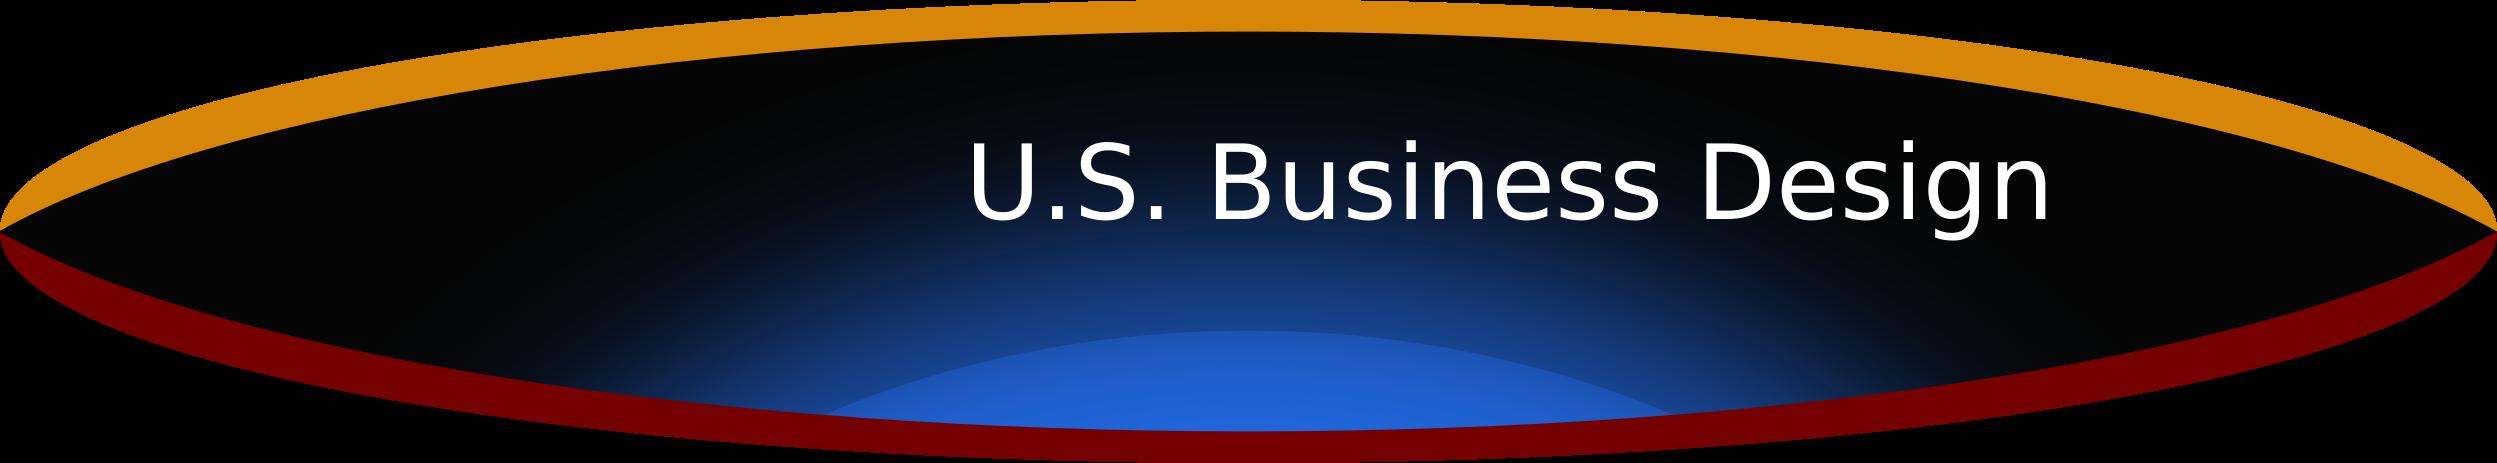 US Business Design